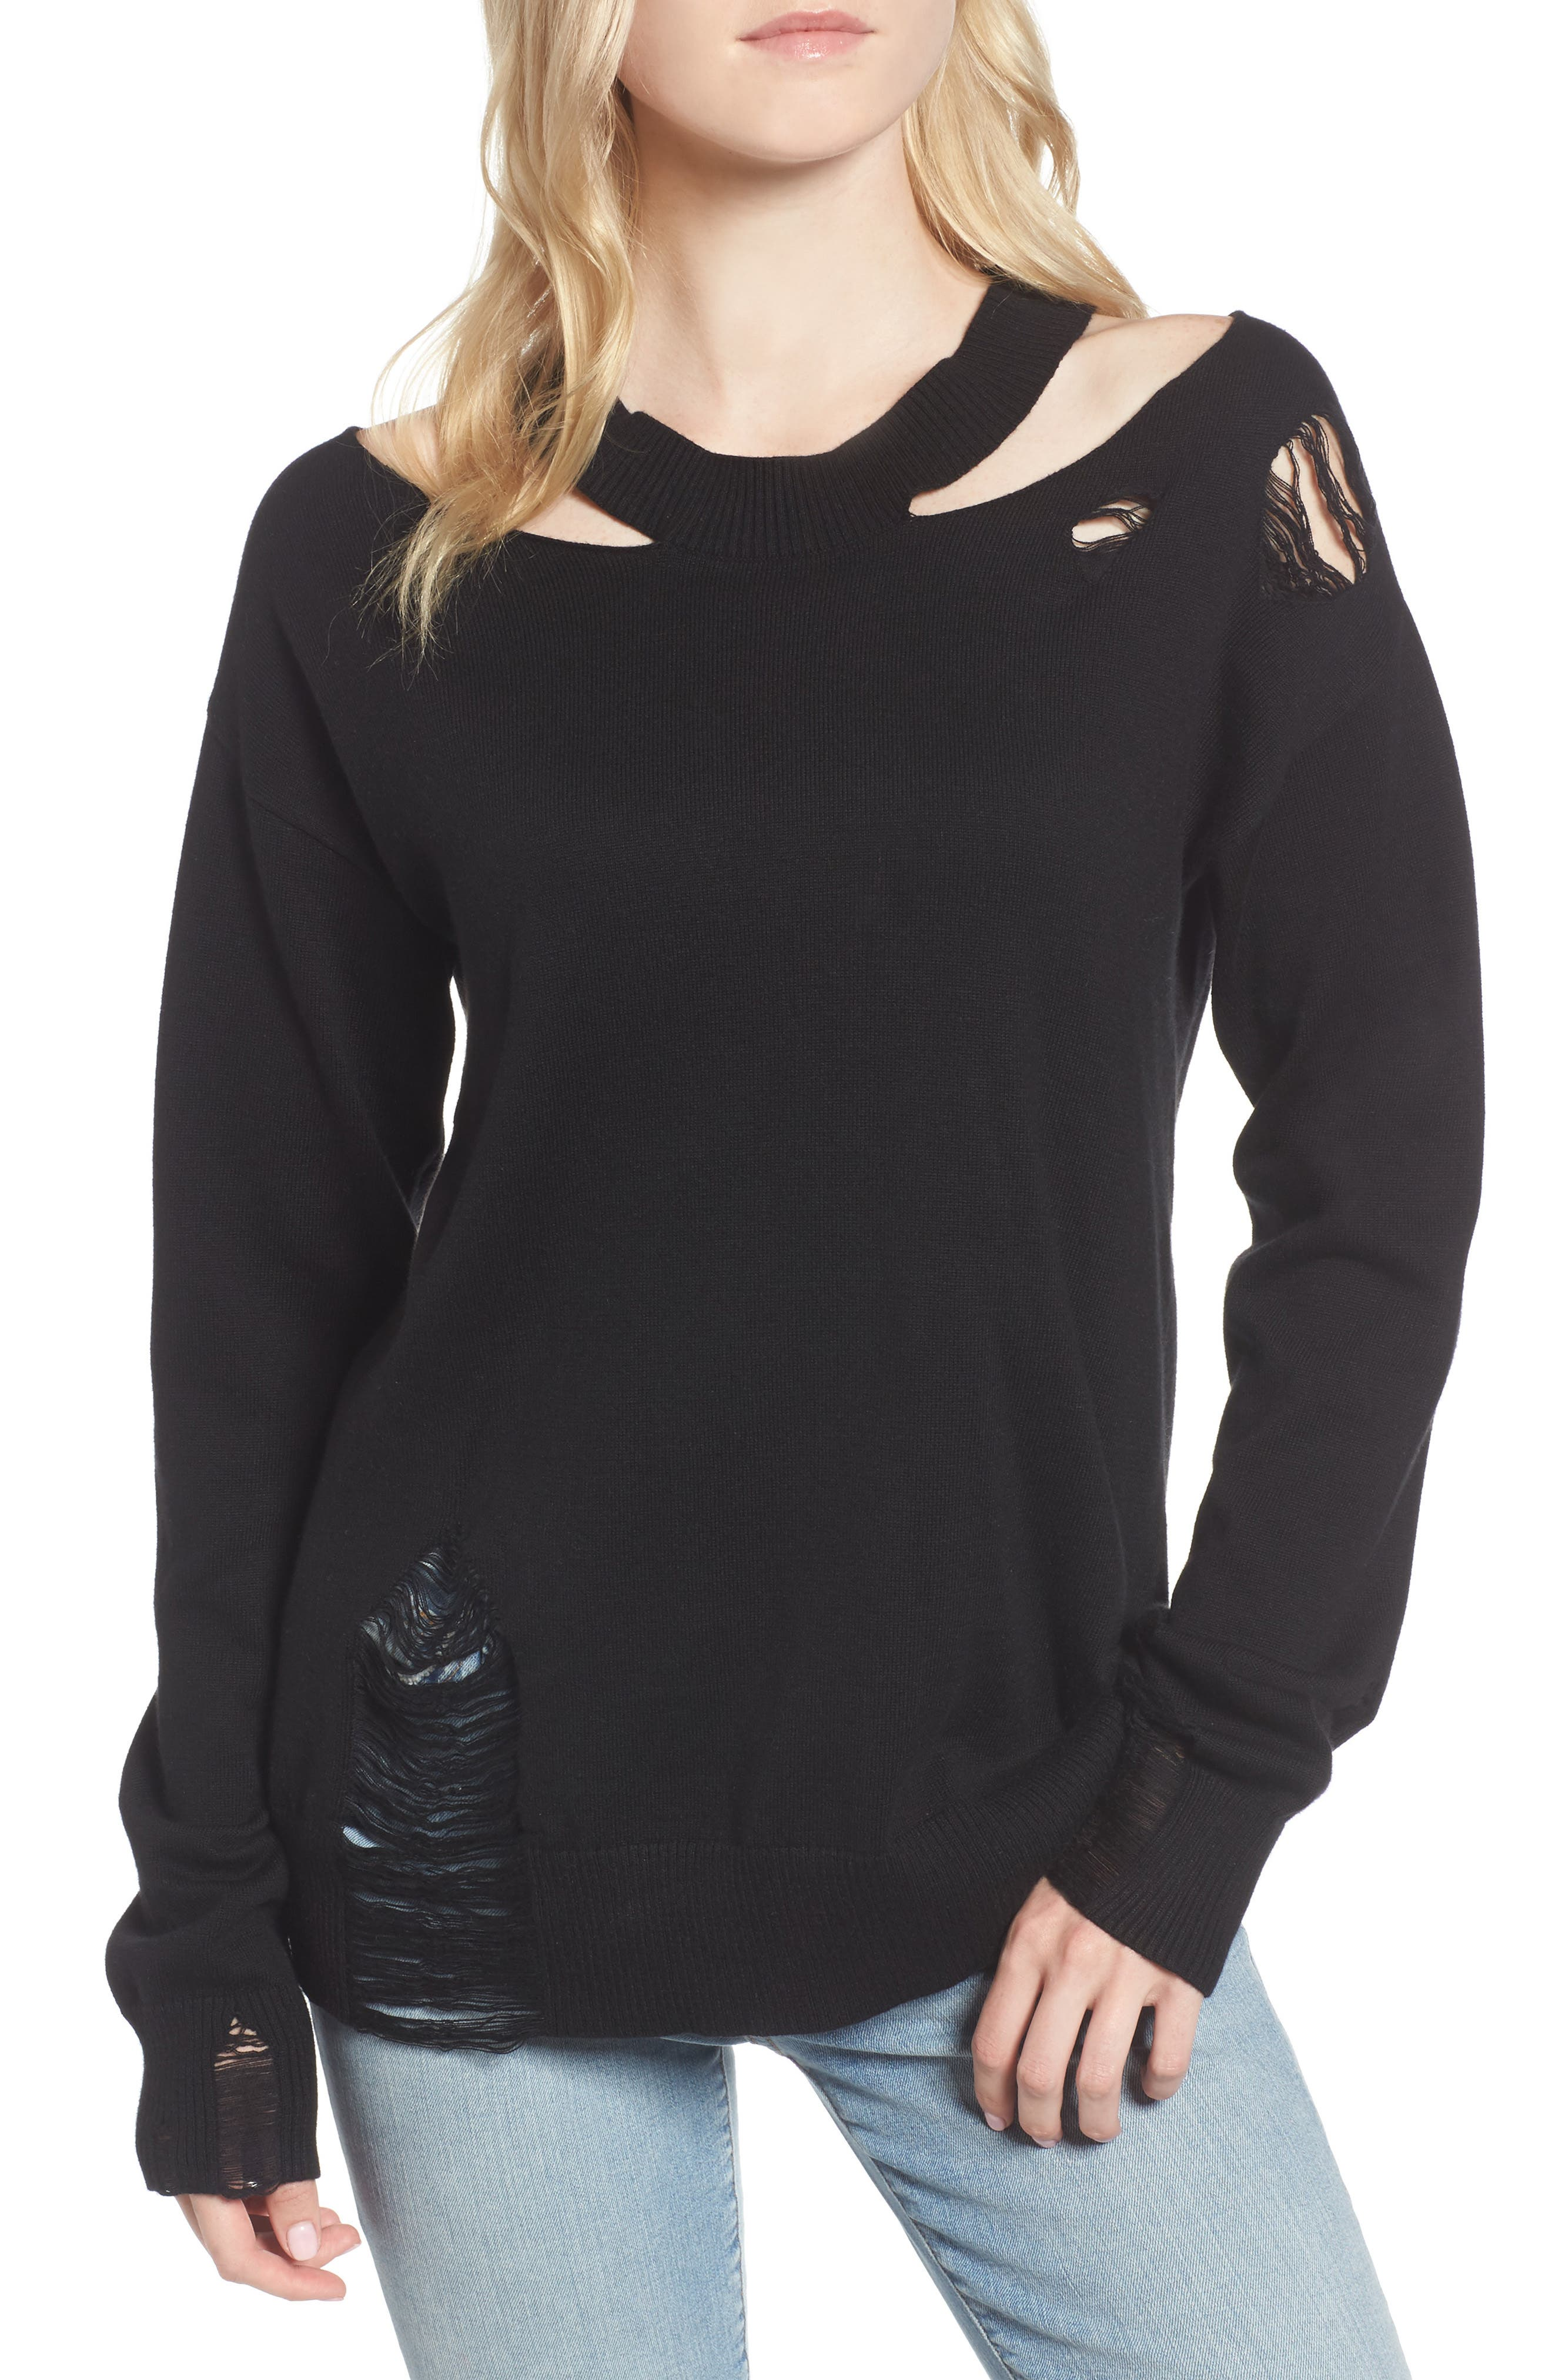 Julian Distressed Sweatshirt,                         Main,                         color, Black Cat